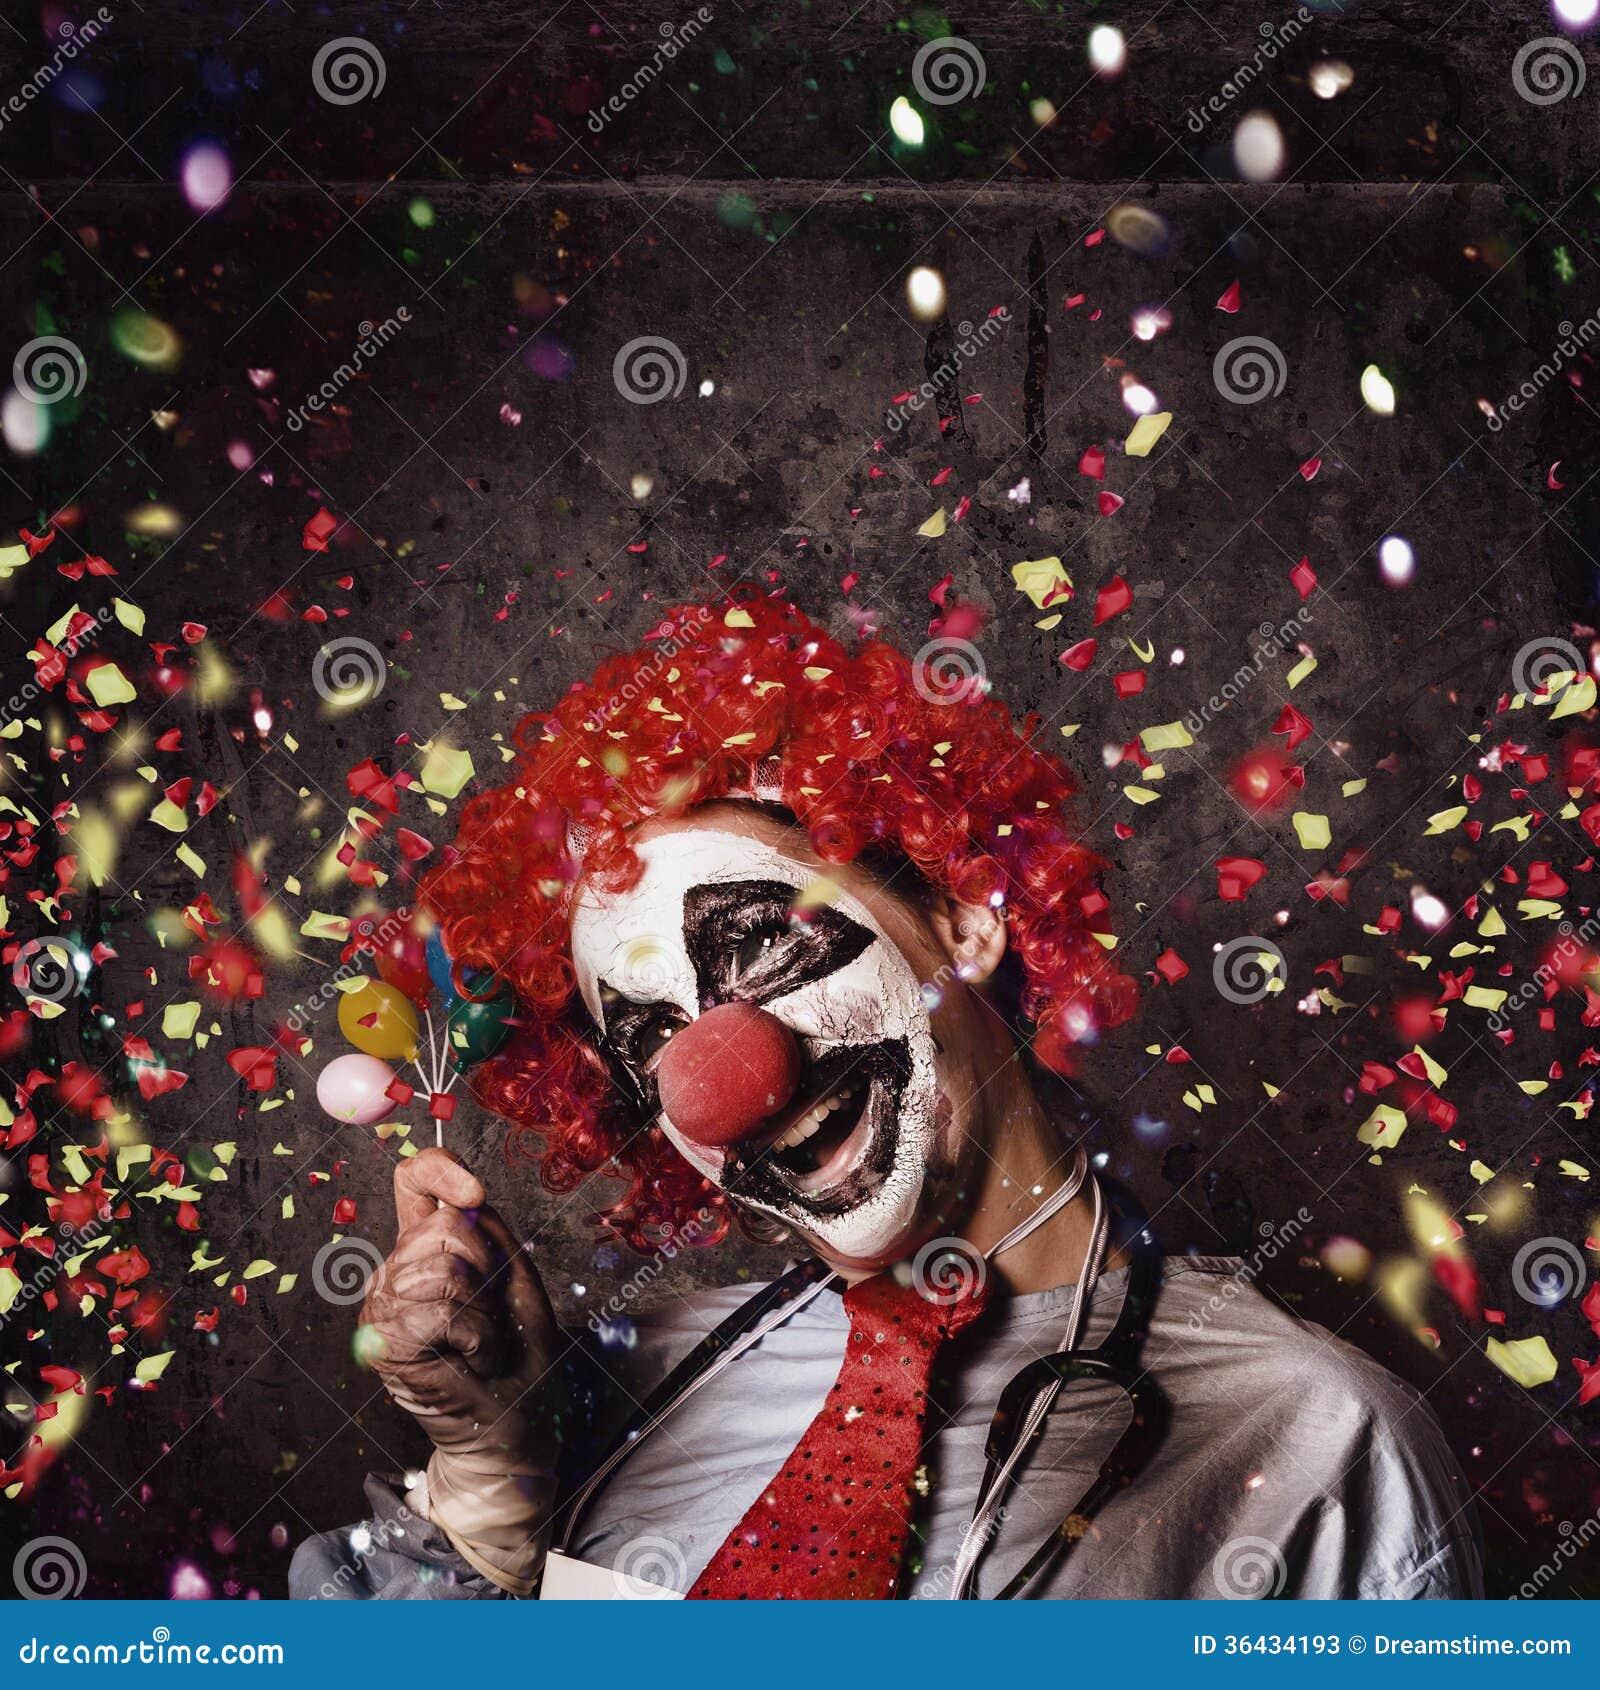 Creepy Birthday Clown At Party Celebration Stock Image